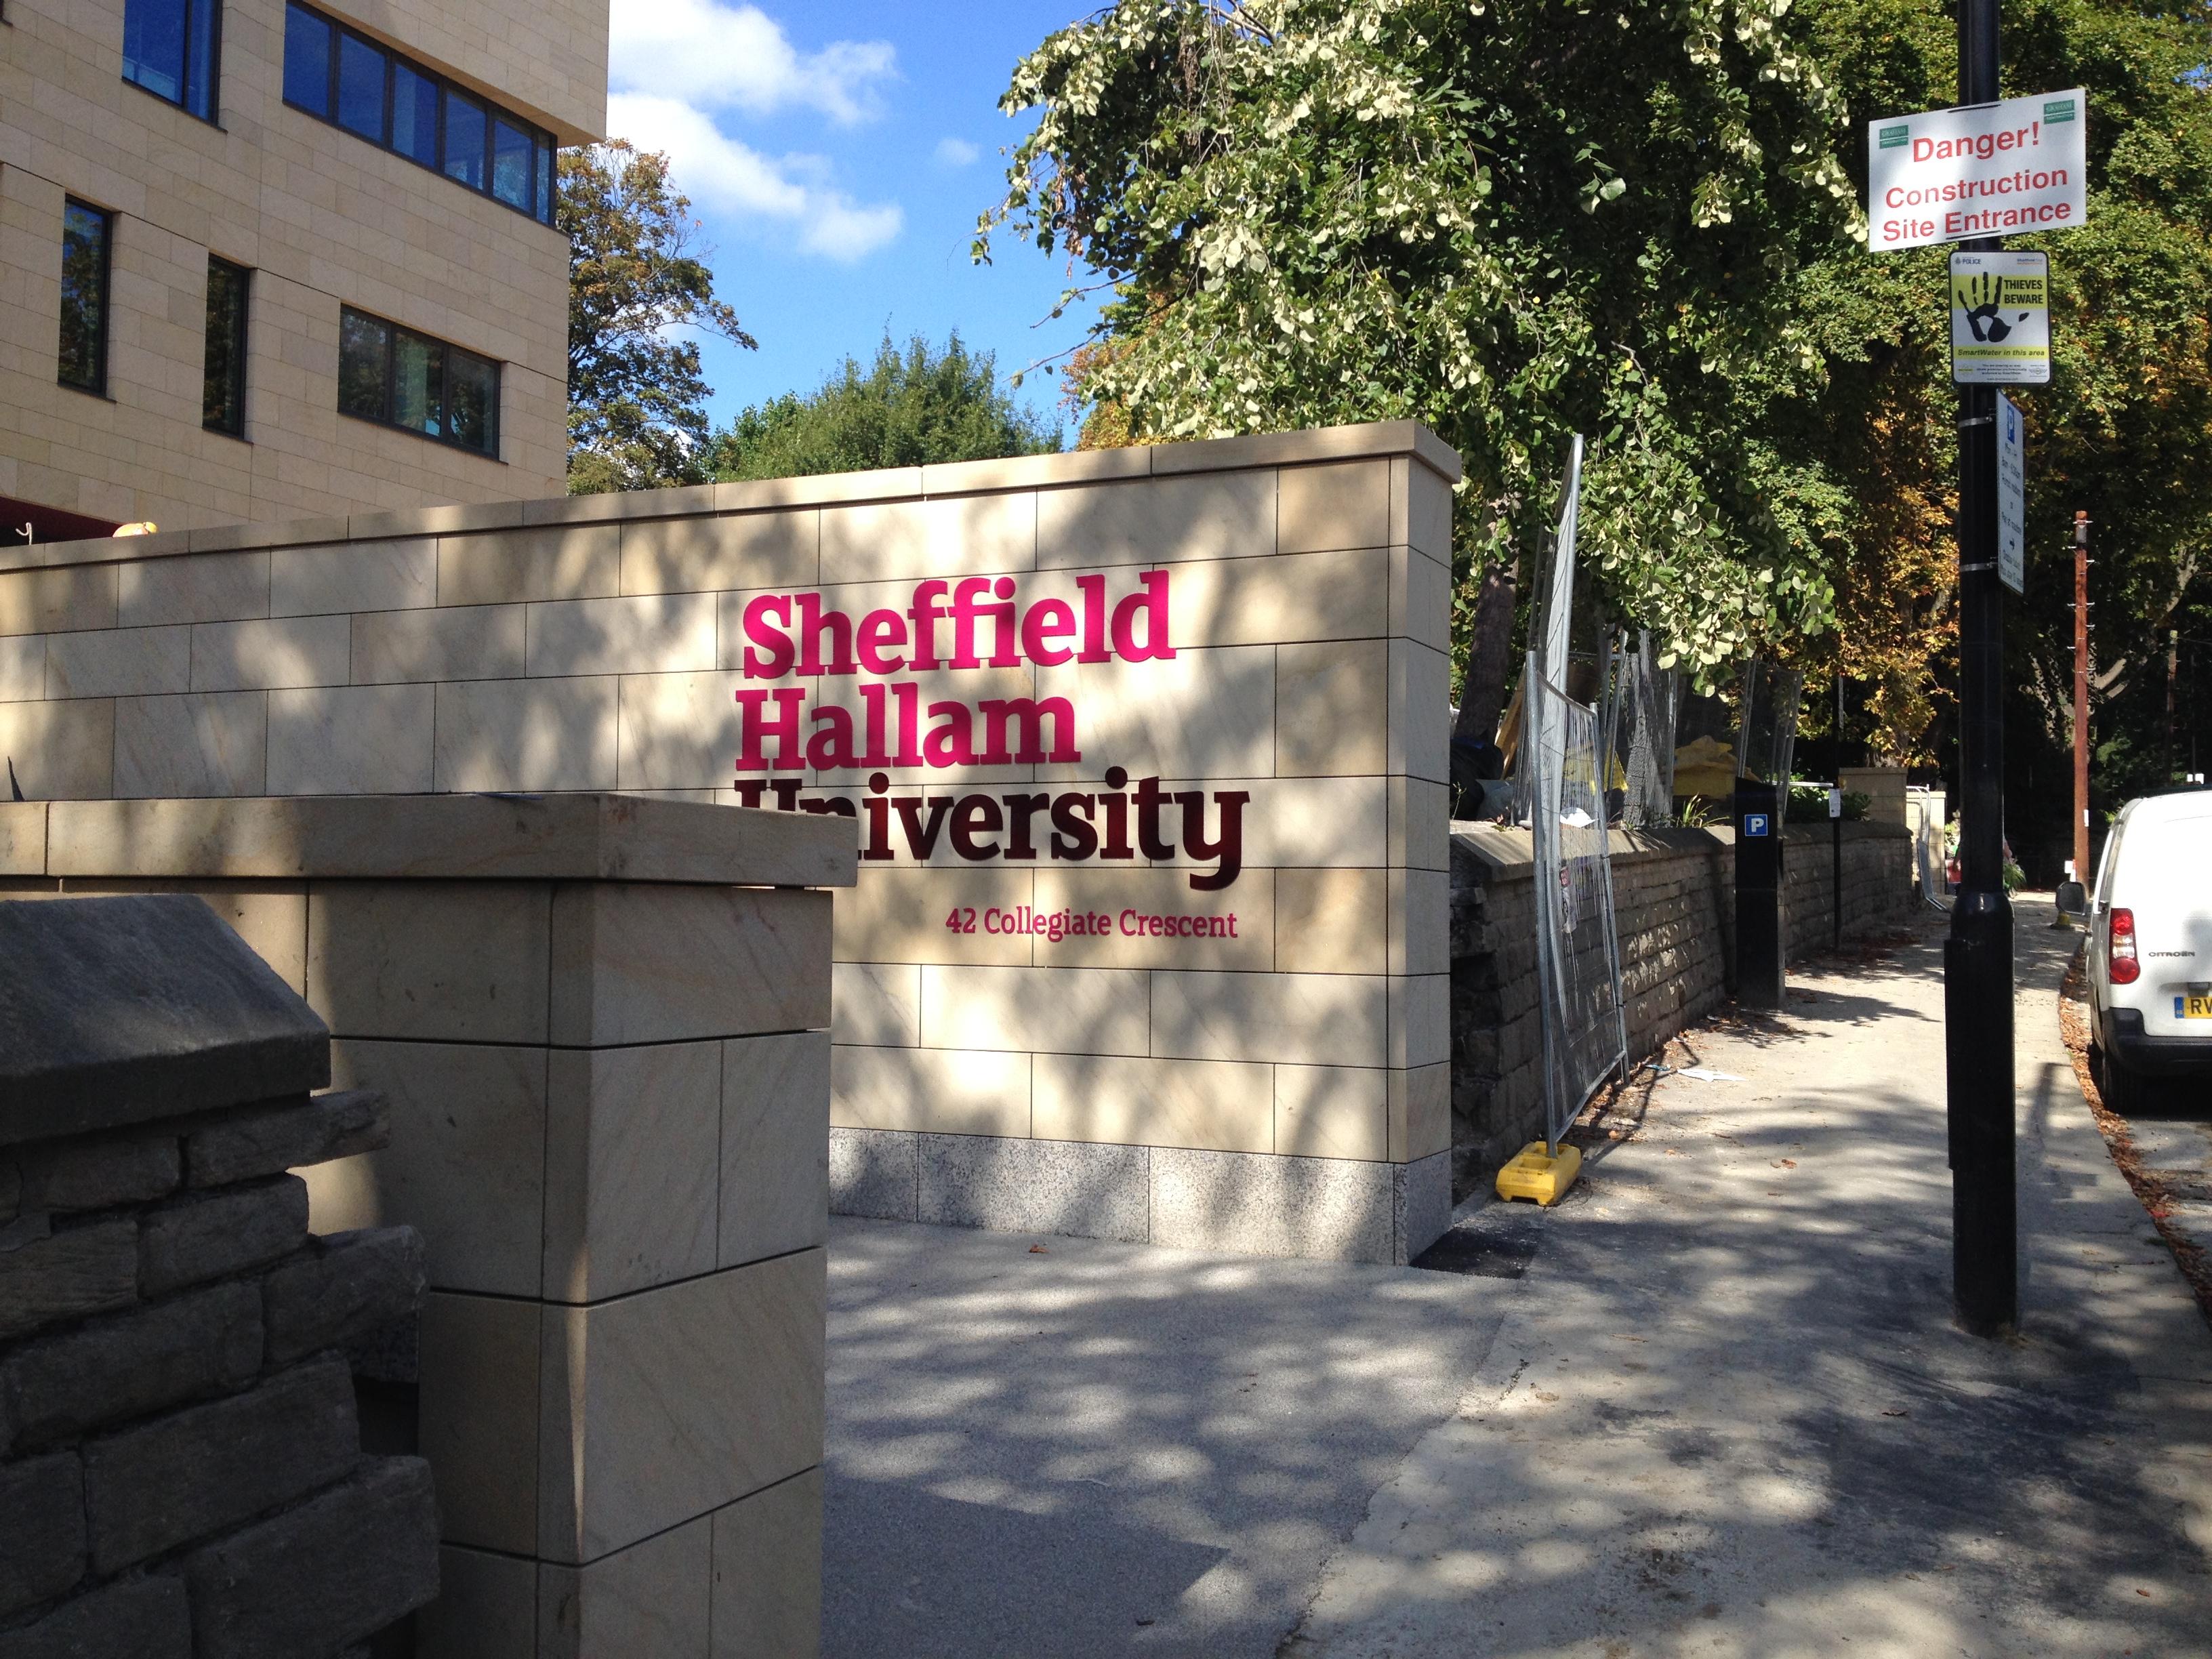 Học bổng Transform Together, ĐH Sheffield Hallam, Anh, 2017